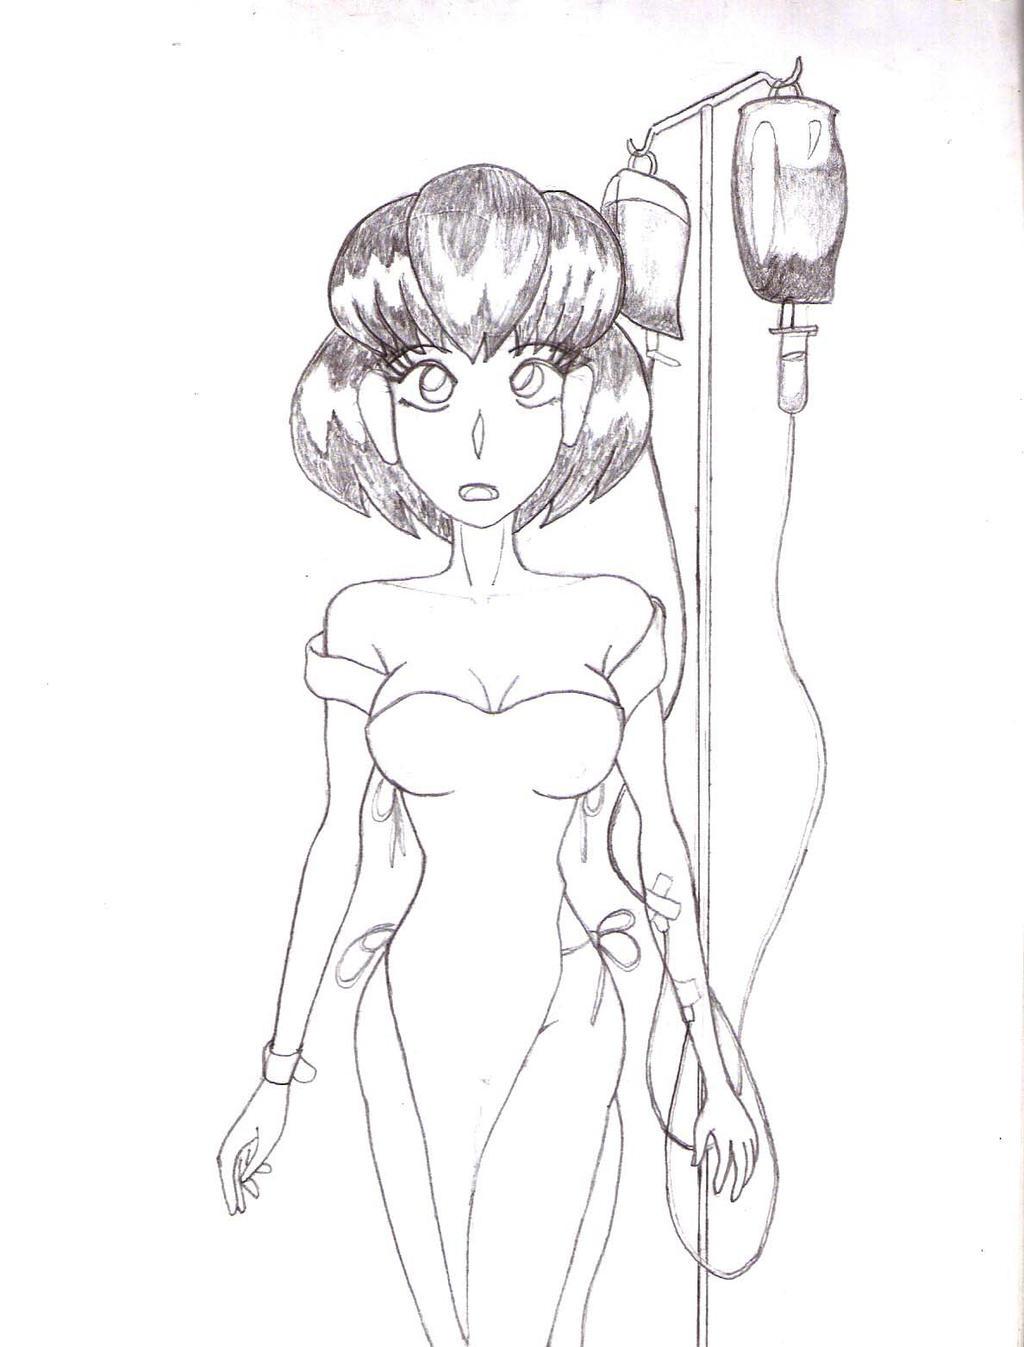 Insanitarium by DUKEYAMASAKI